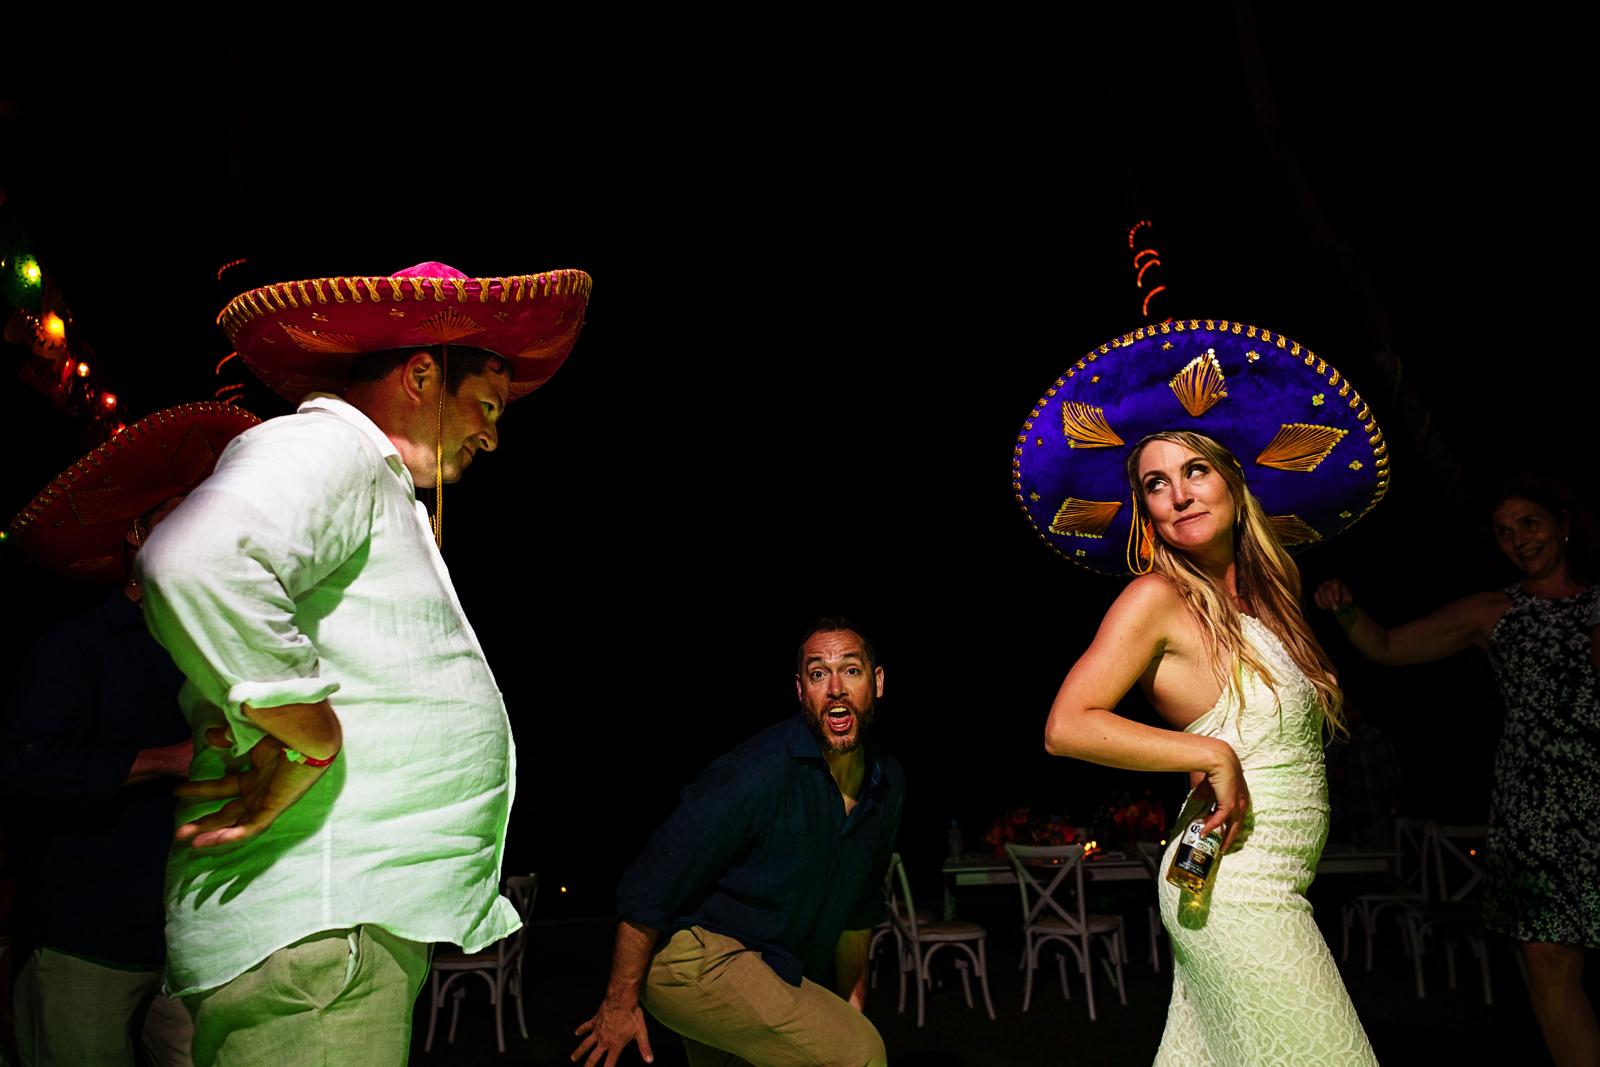 Sombrero dancing battle between the bride and a wedding guest